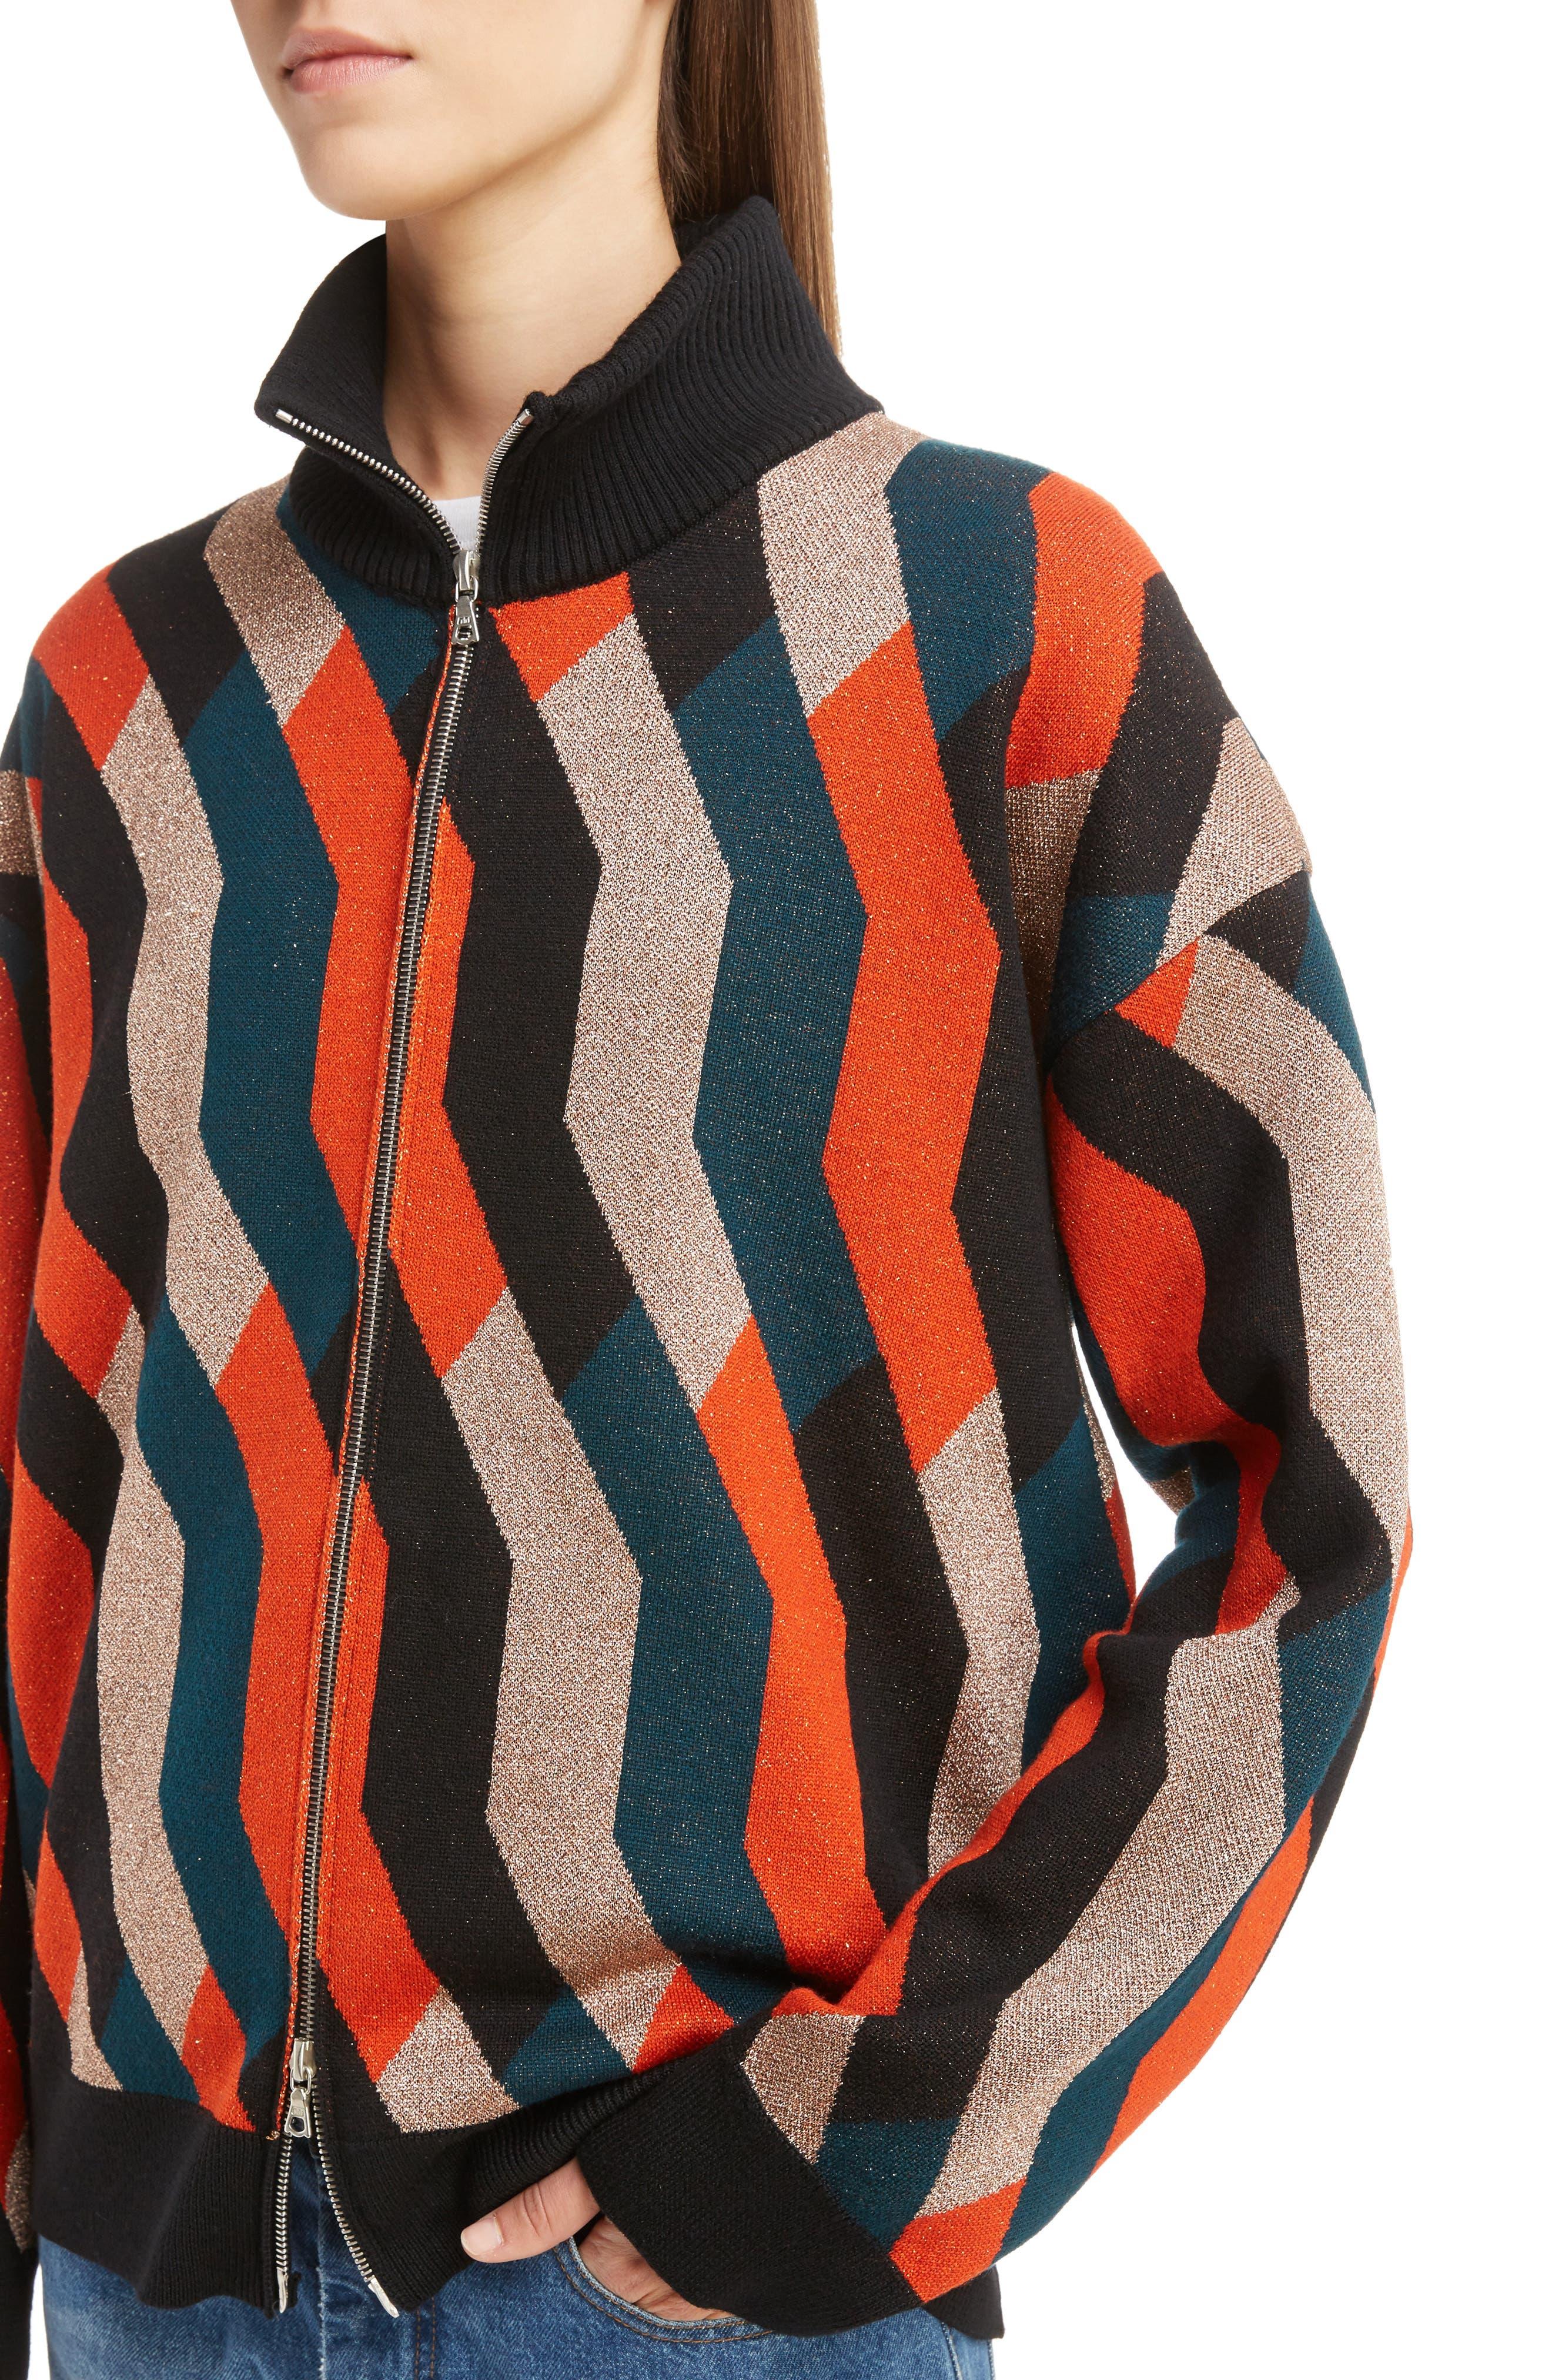 Graphic Knit Merino Wool Cardigan,                             Alternate thumbnail 5, color,                             Skin